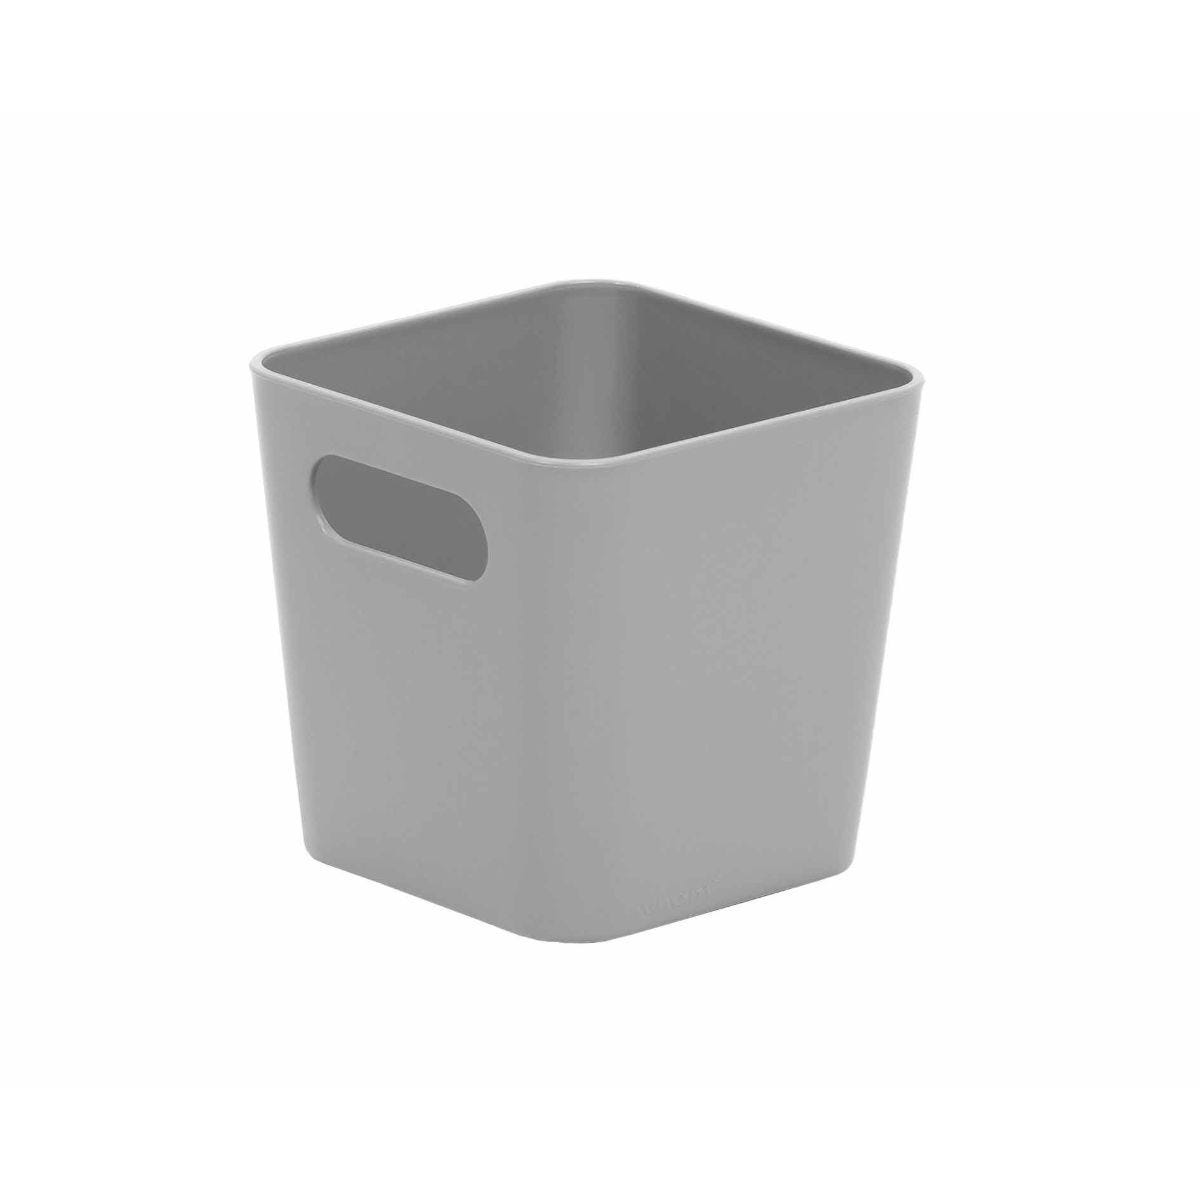 Wham Studio Square Basket 1.01 Grey